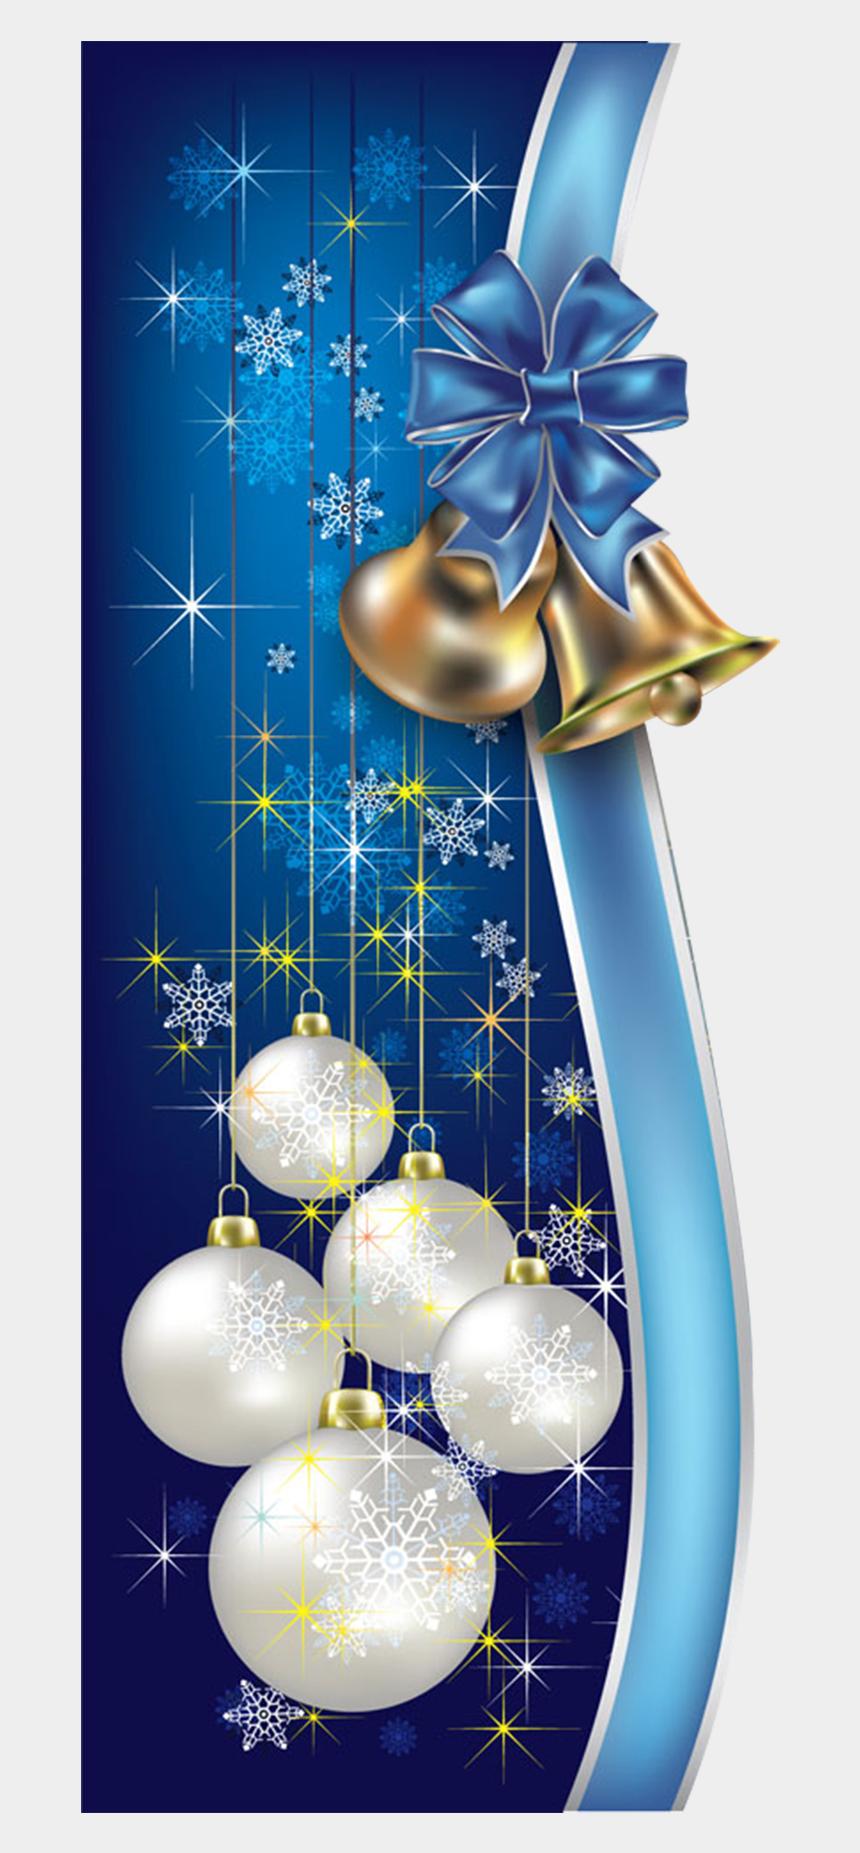 christmas border clipart, Cartoons - Blue Decorative Claus Tree Santa Year Borders Clipart - Christmas Songs Playlist 2018